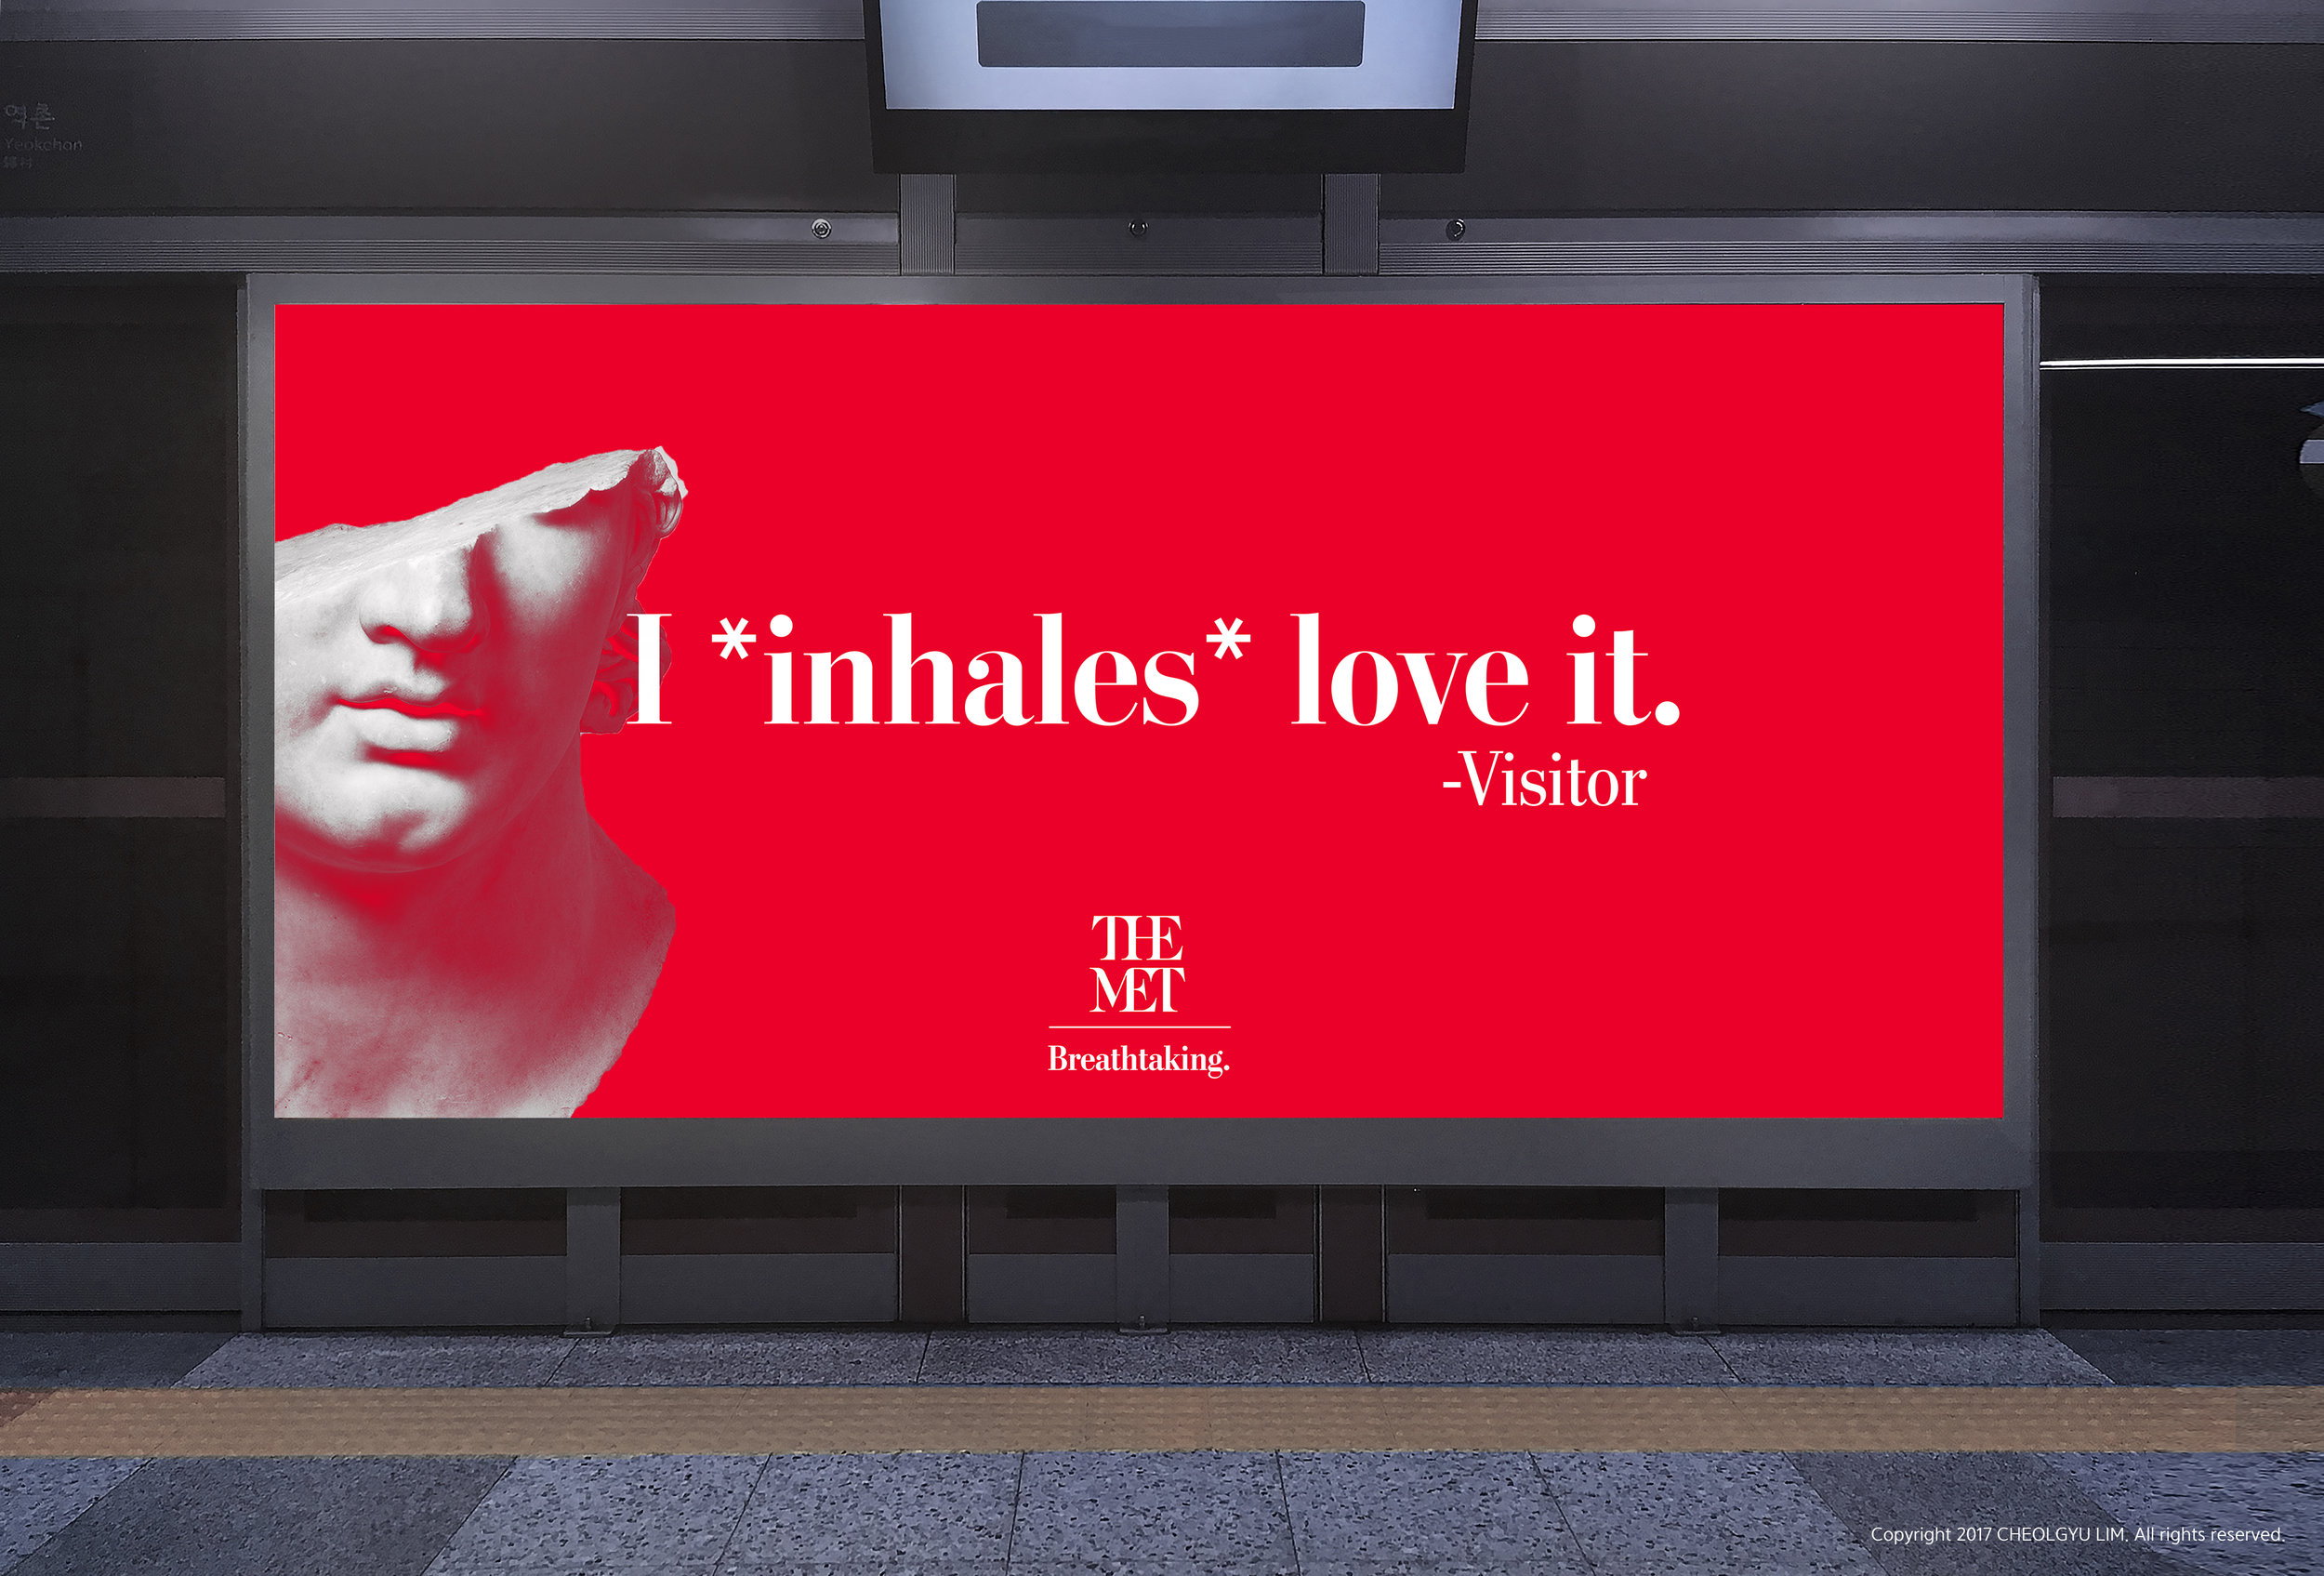 inhalebillboard.jpg